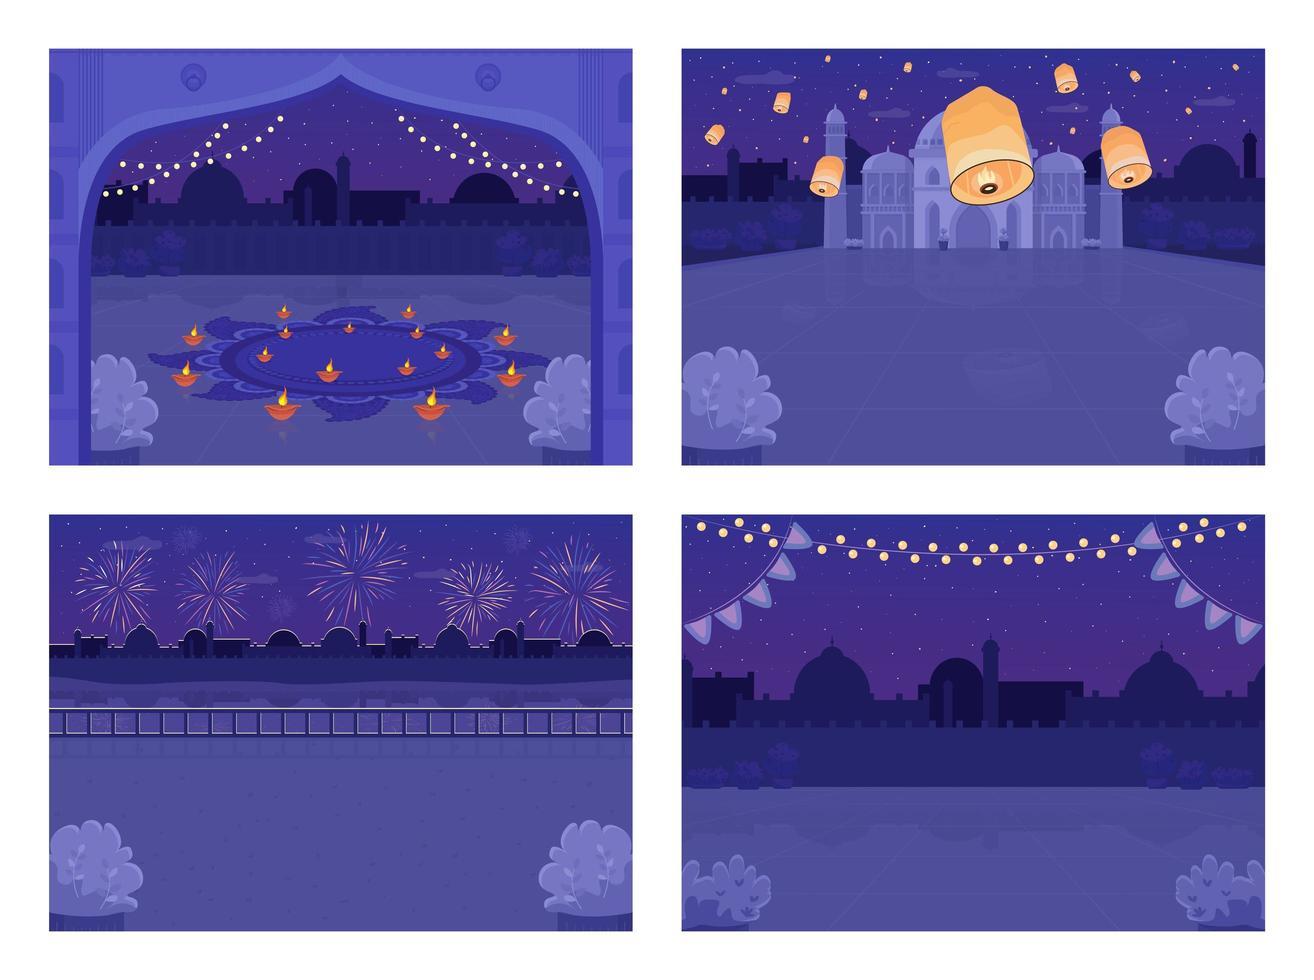 Nacht hinduistische Feiertagsfeier vektor